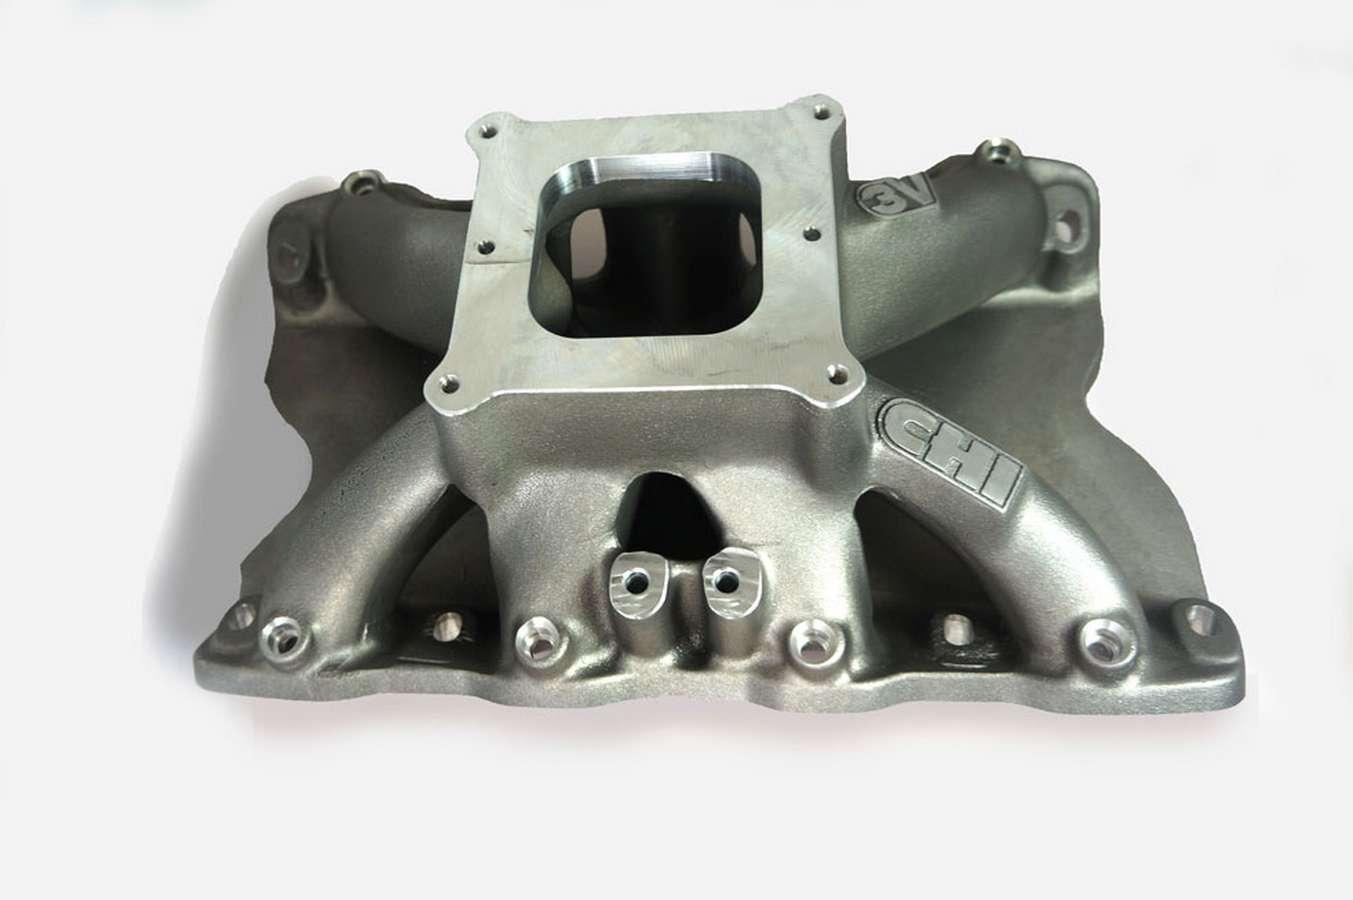 Intake Manifold - 3V 225cc Windsor 9.2